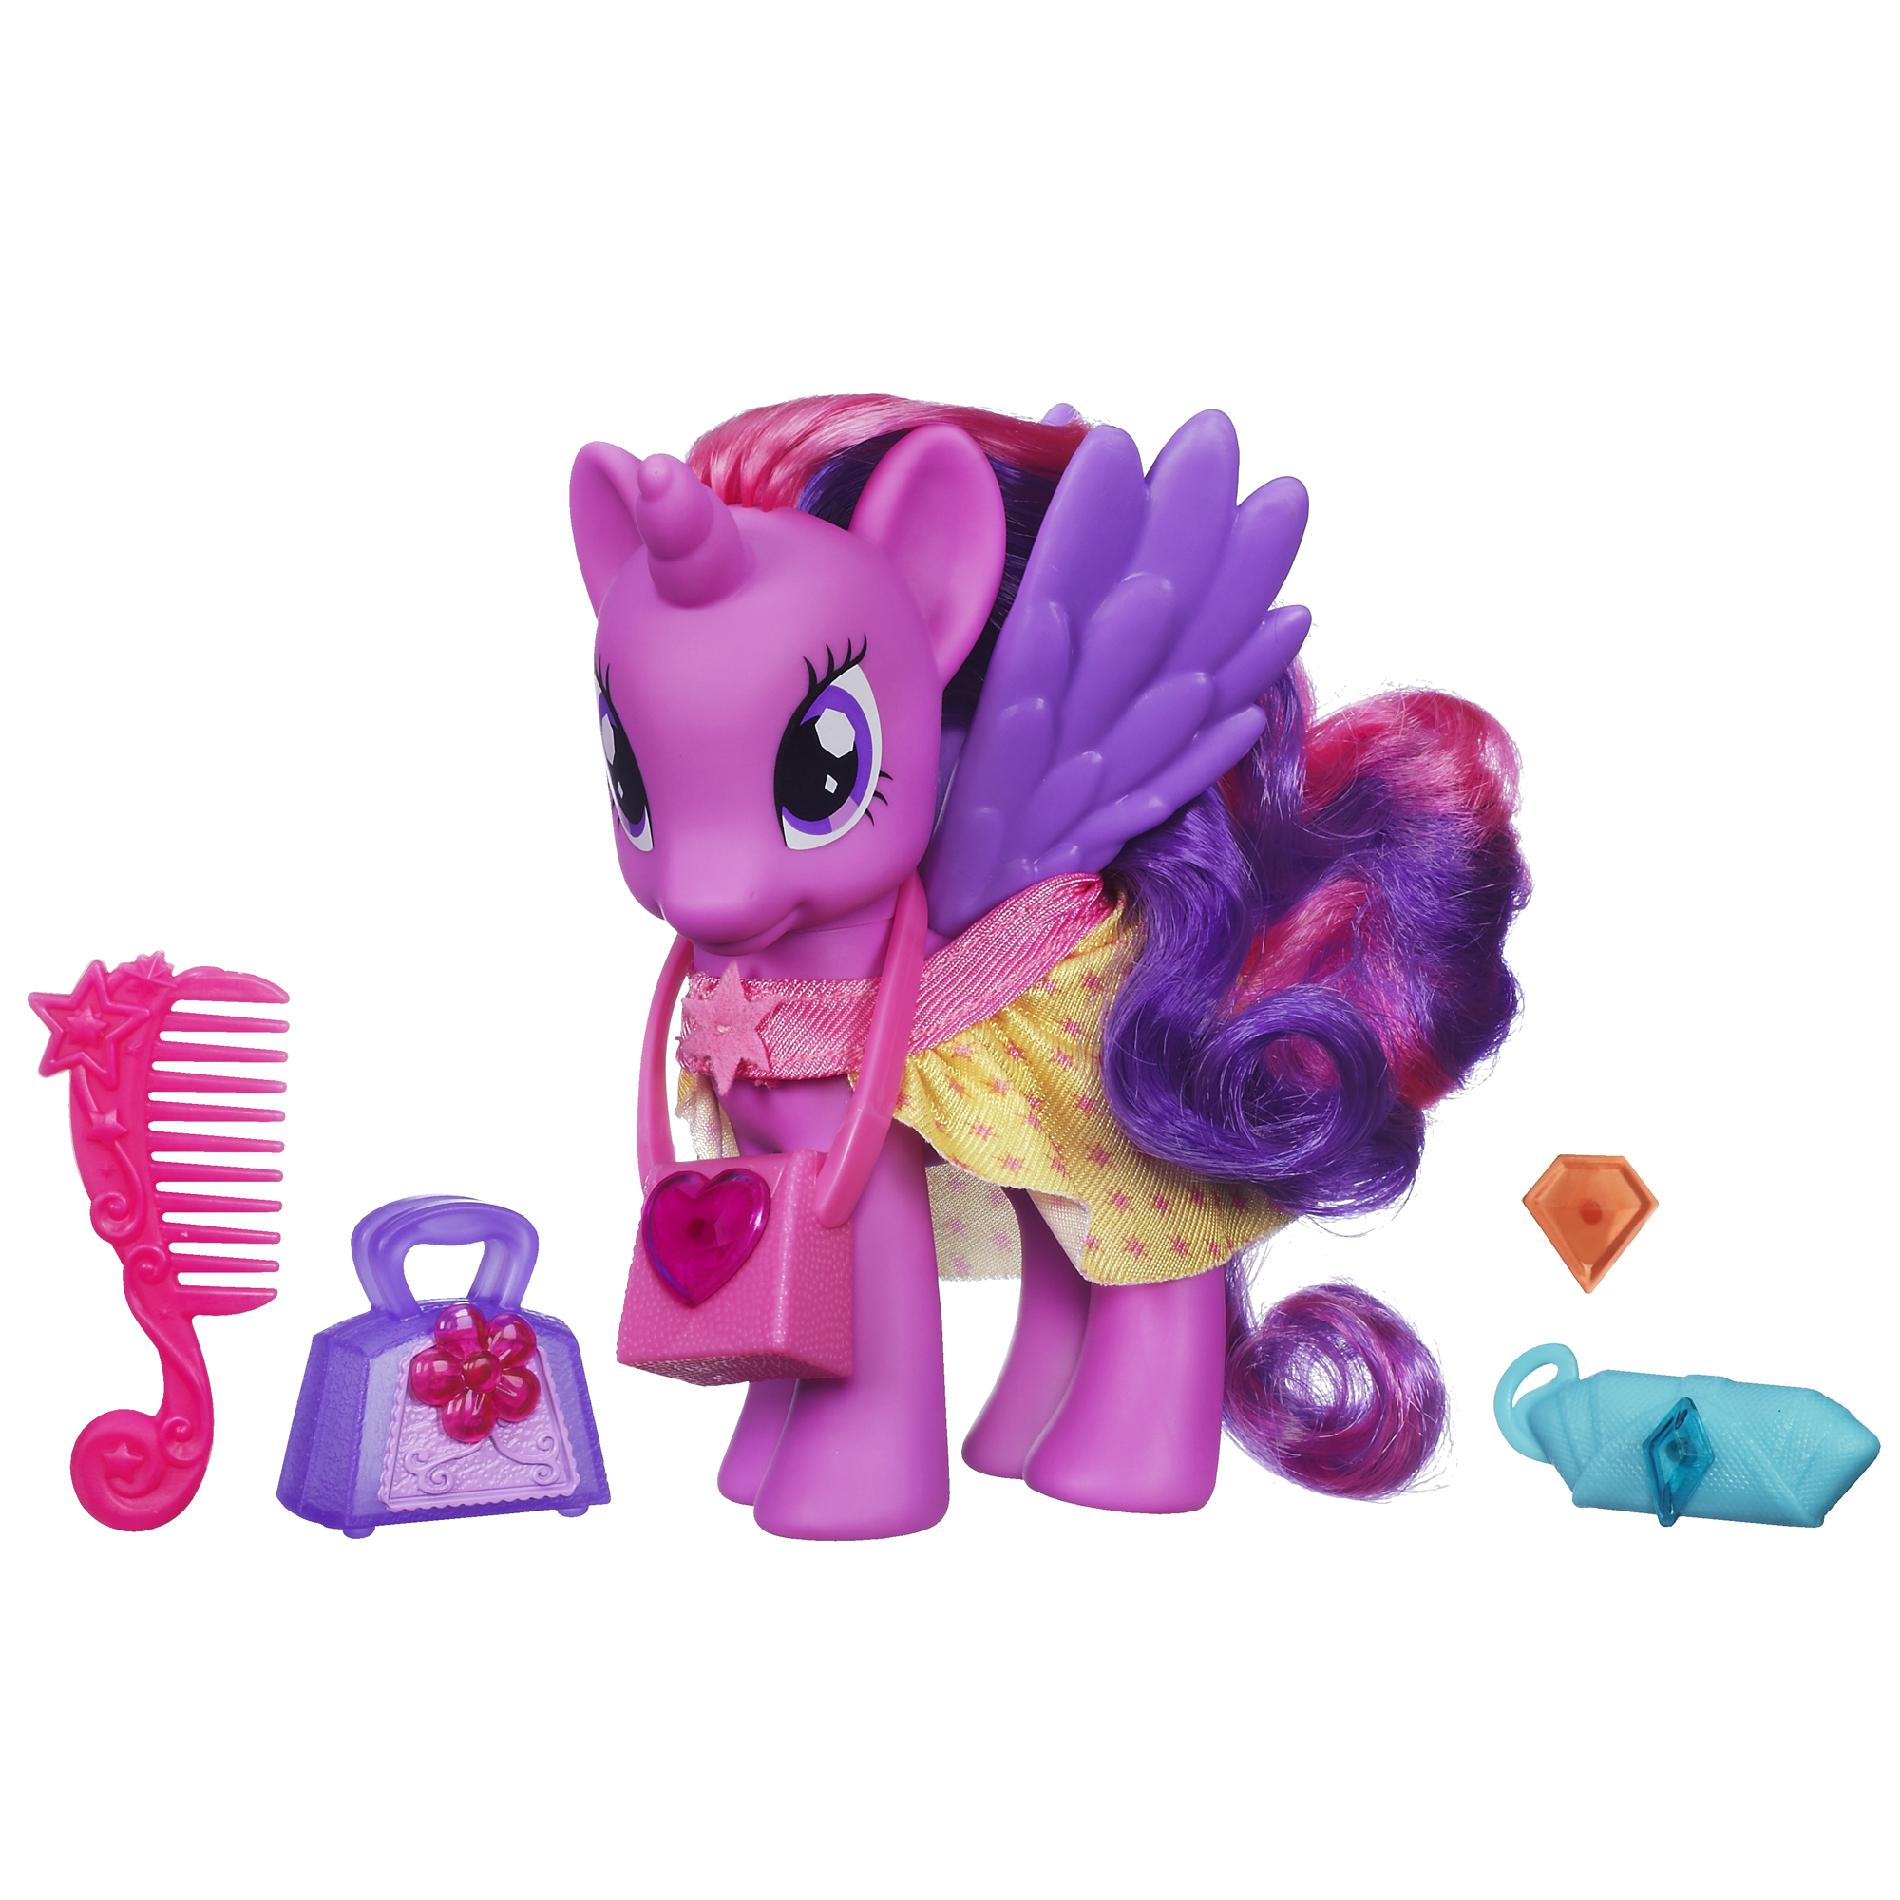 Little Pony Fashion Style- Princess Twilight Sparkle - Toys & Games Dolls Accessories